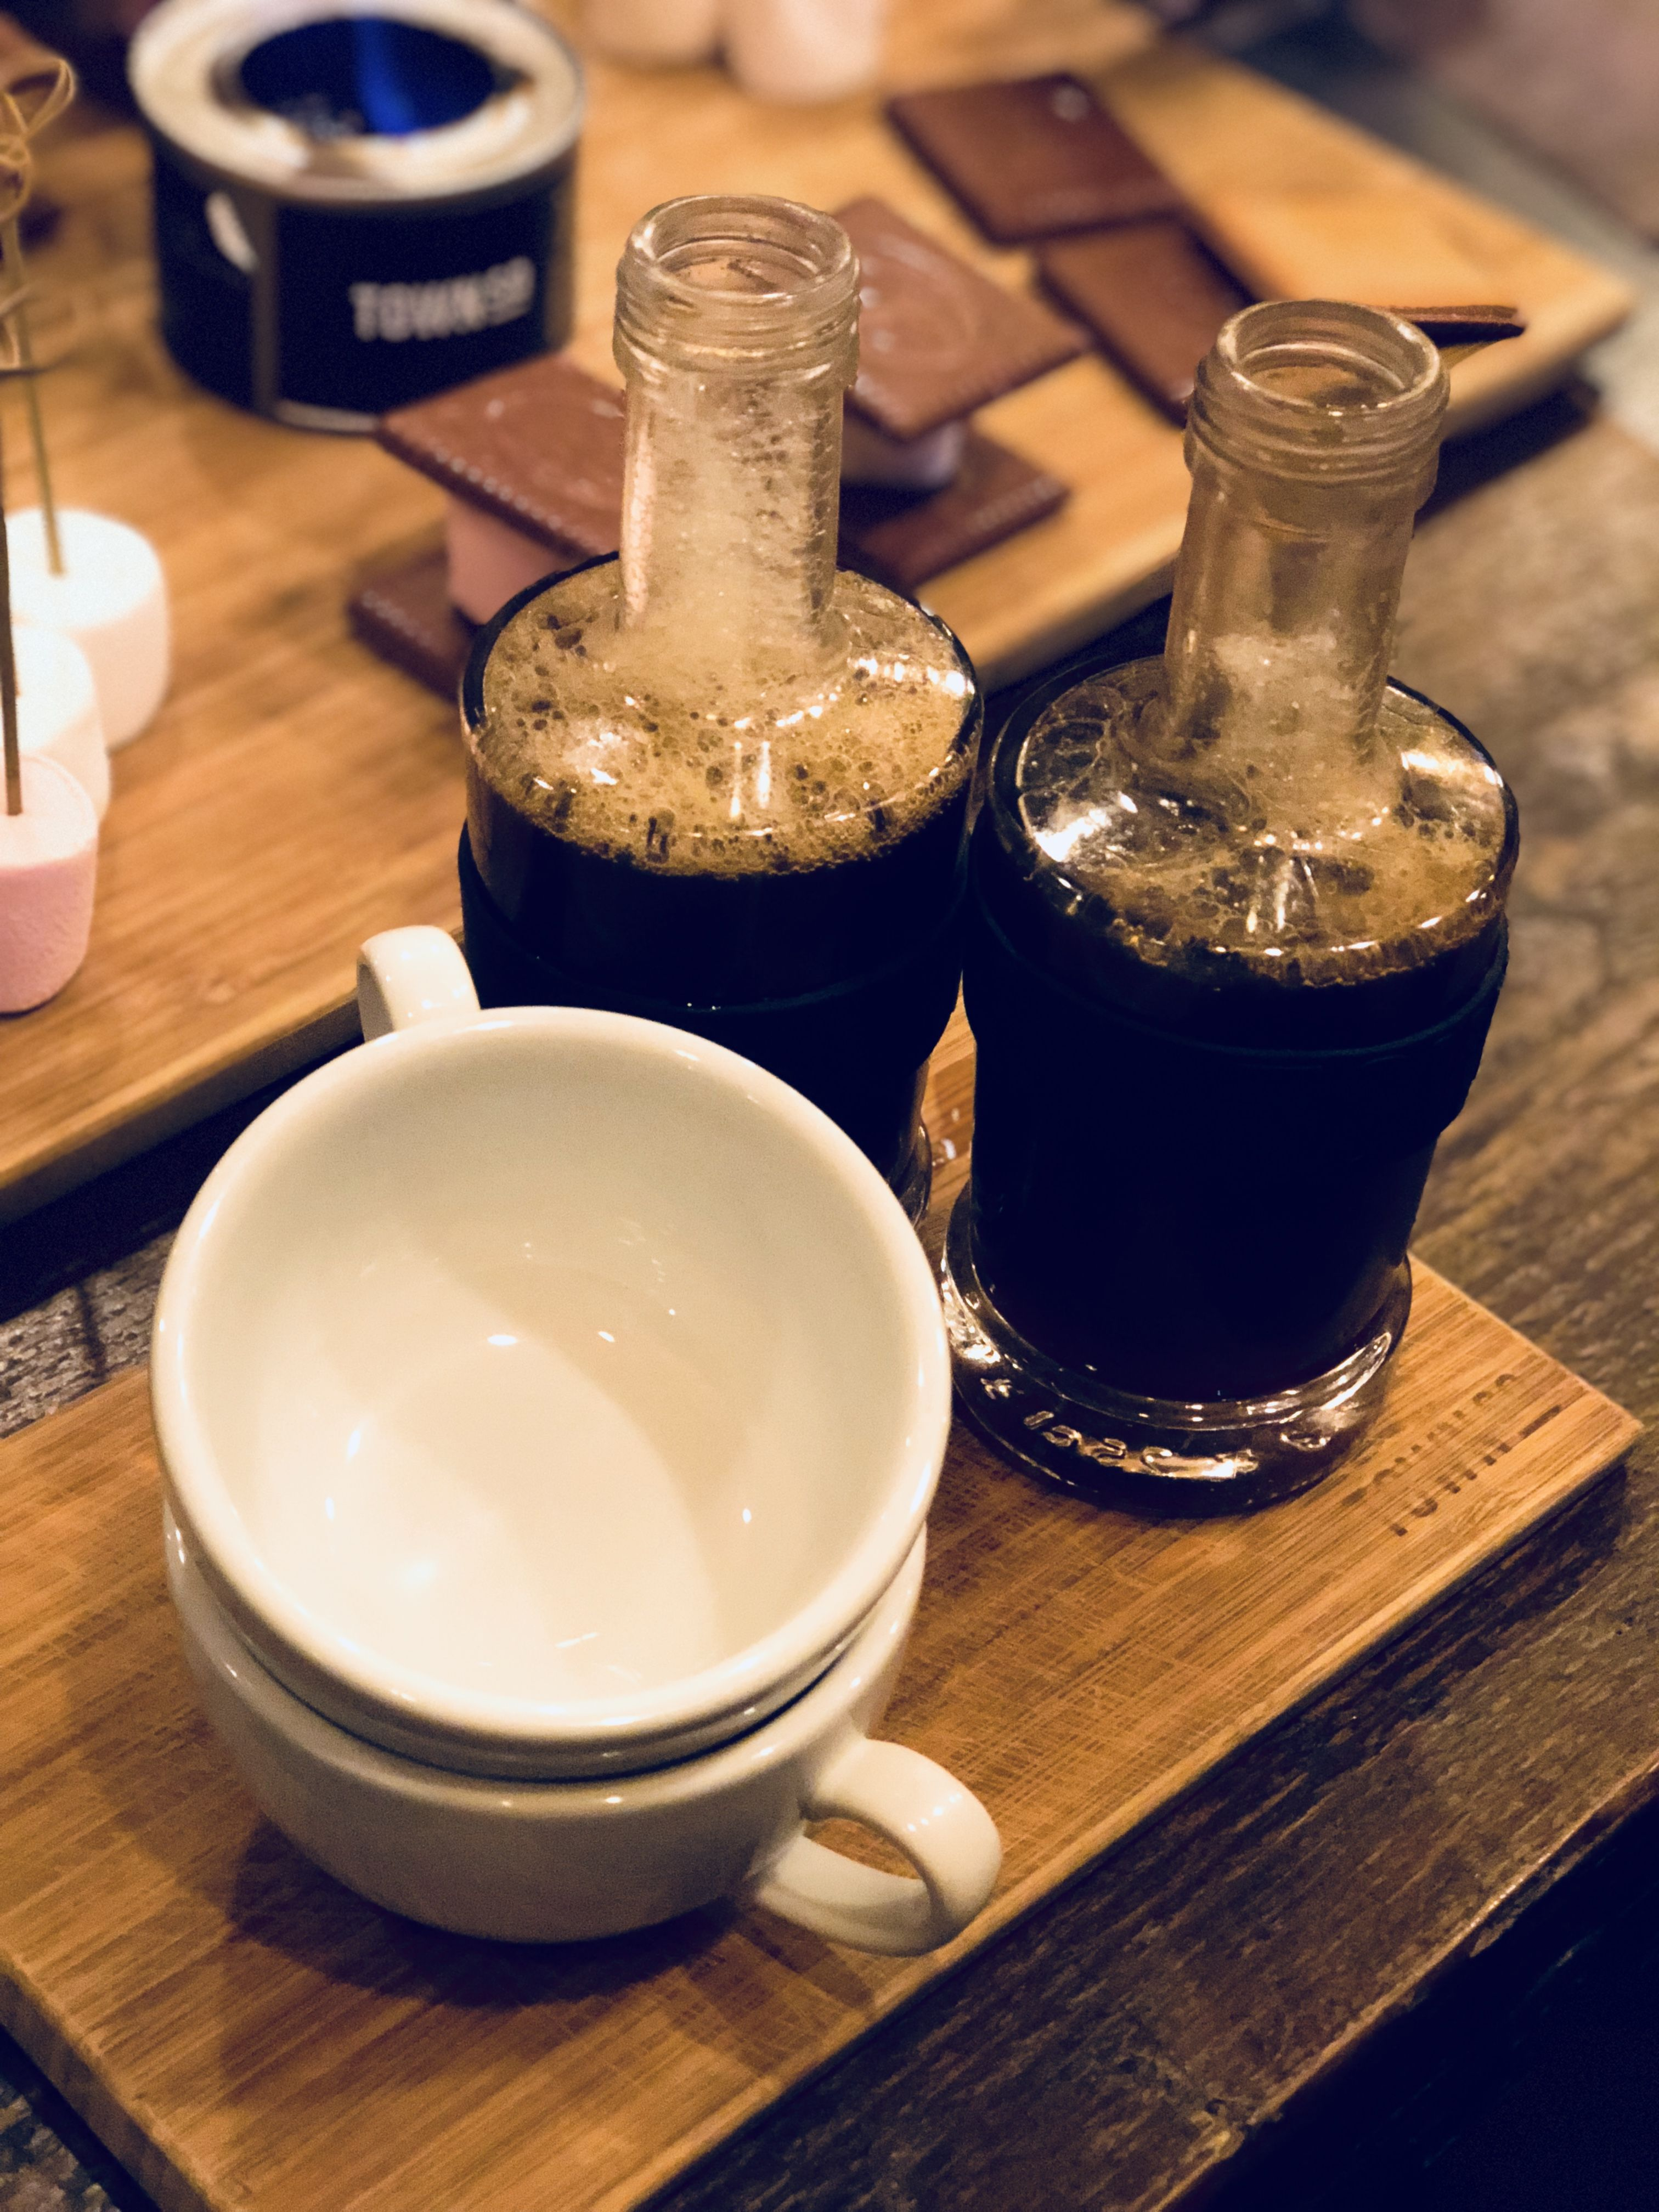 Town Square|Belfast | Coffee, V60 coffee, Coffee maker